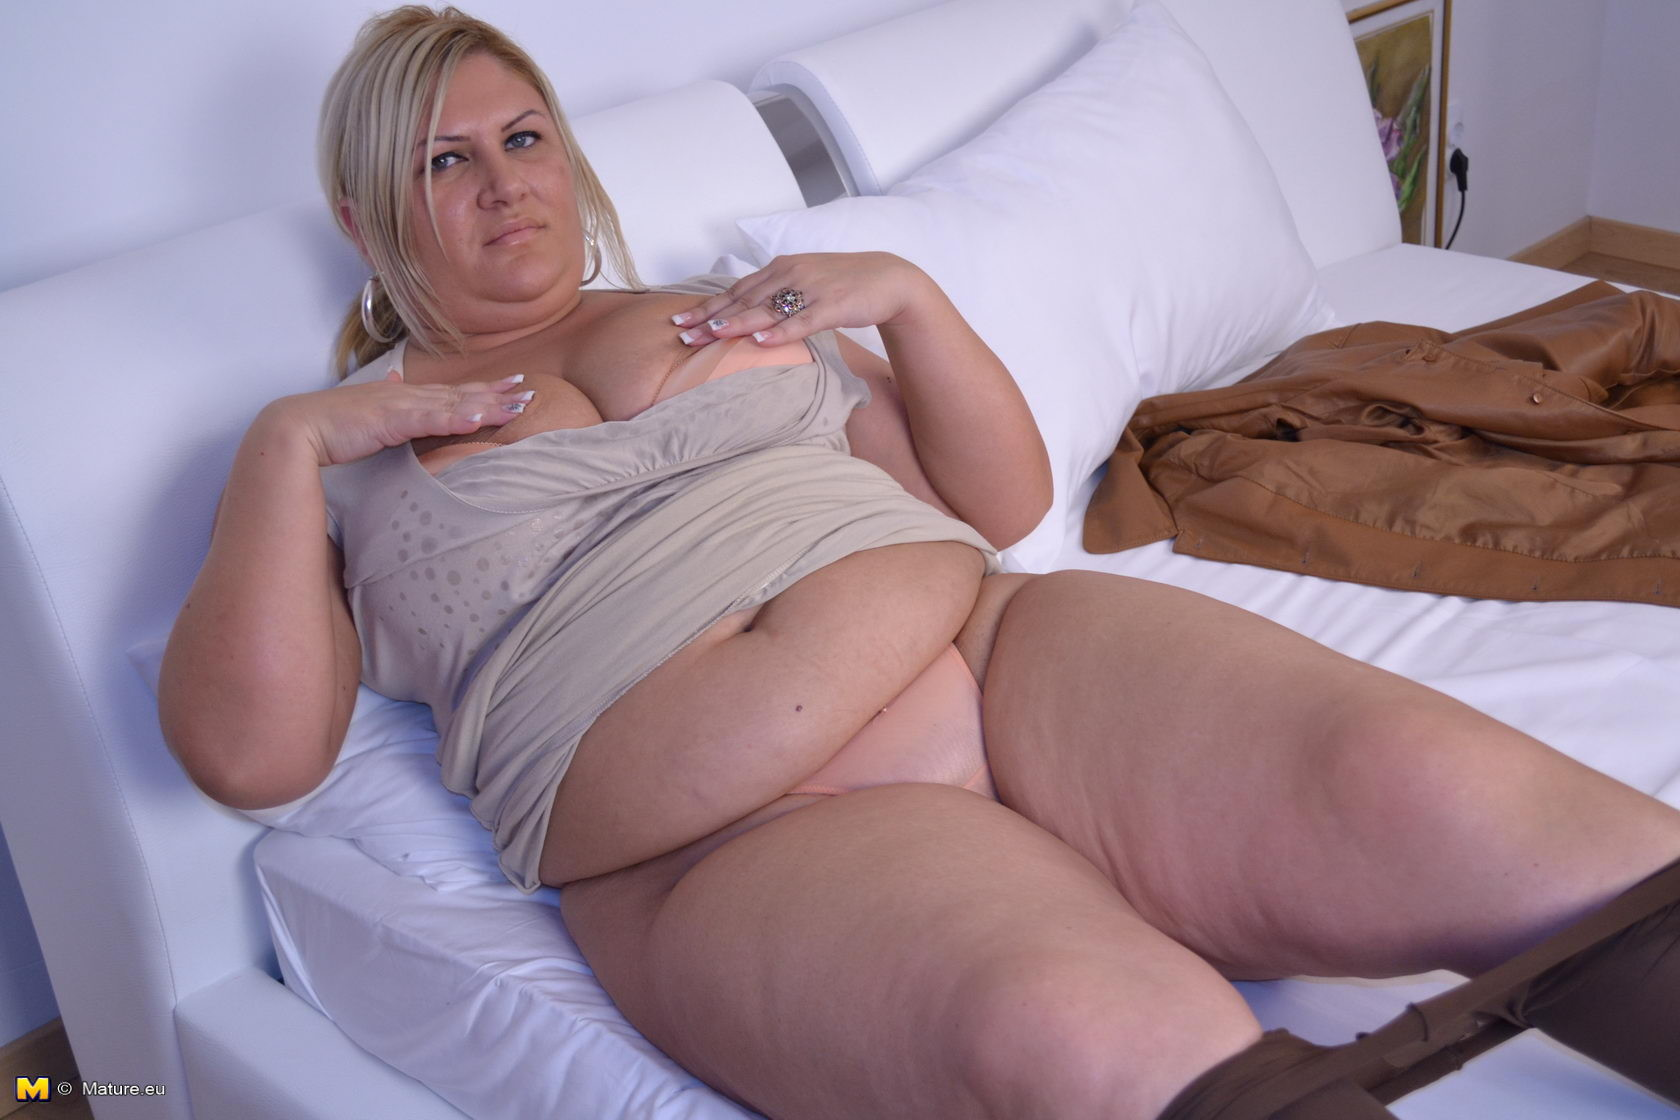 Зрелая женщина - Галерея № 3551398